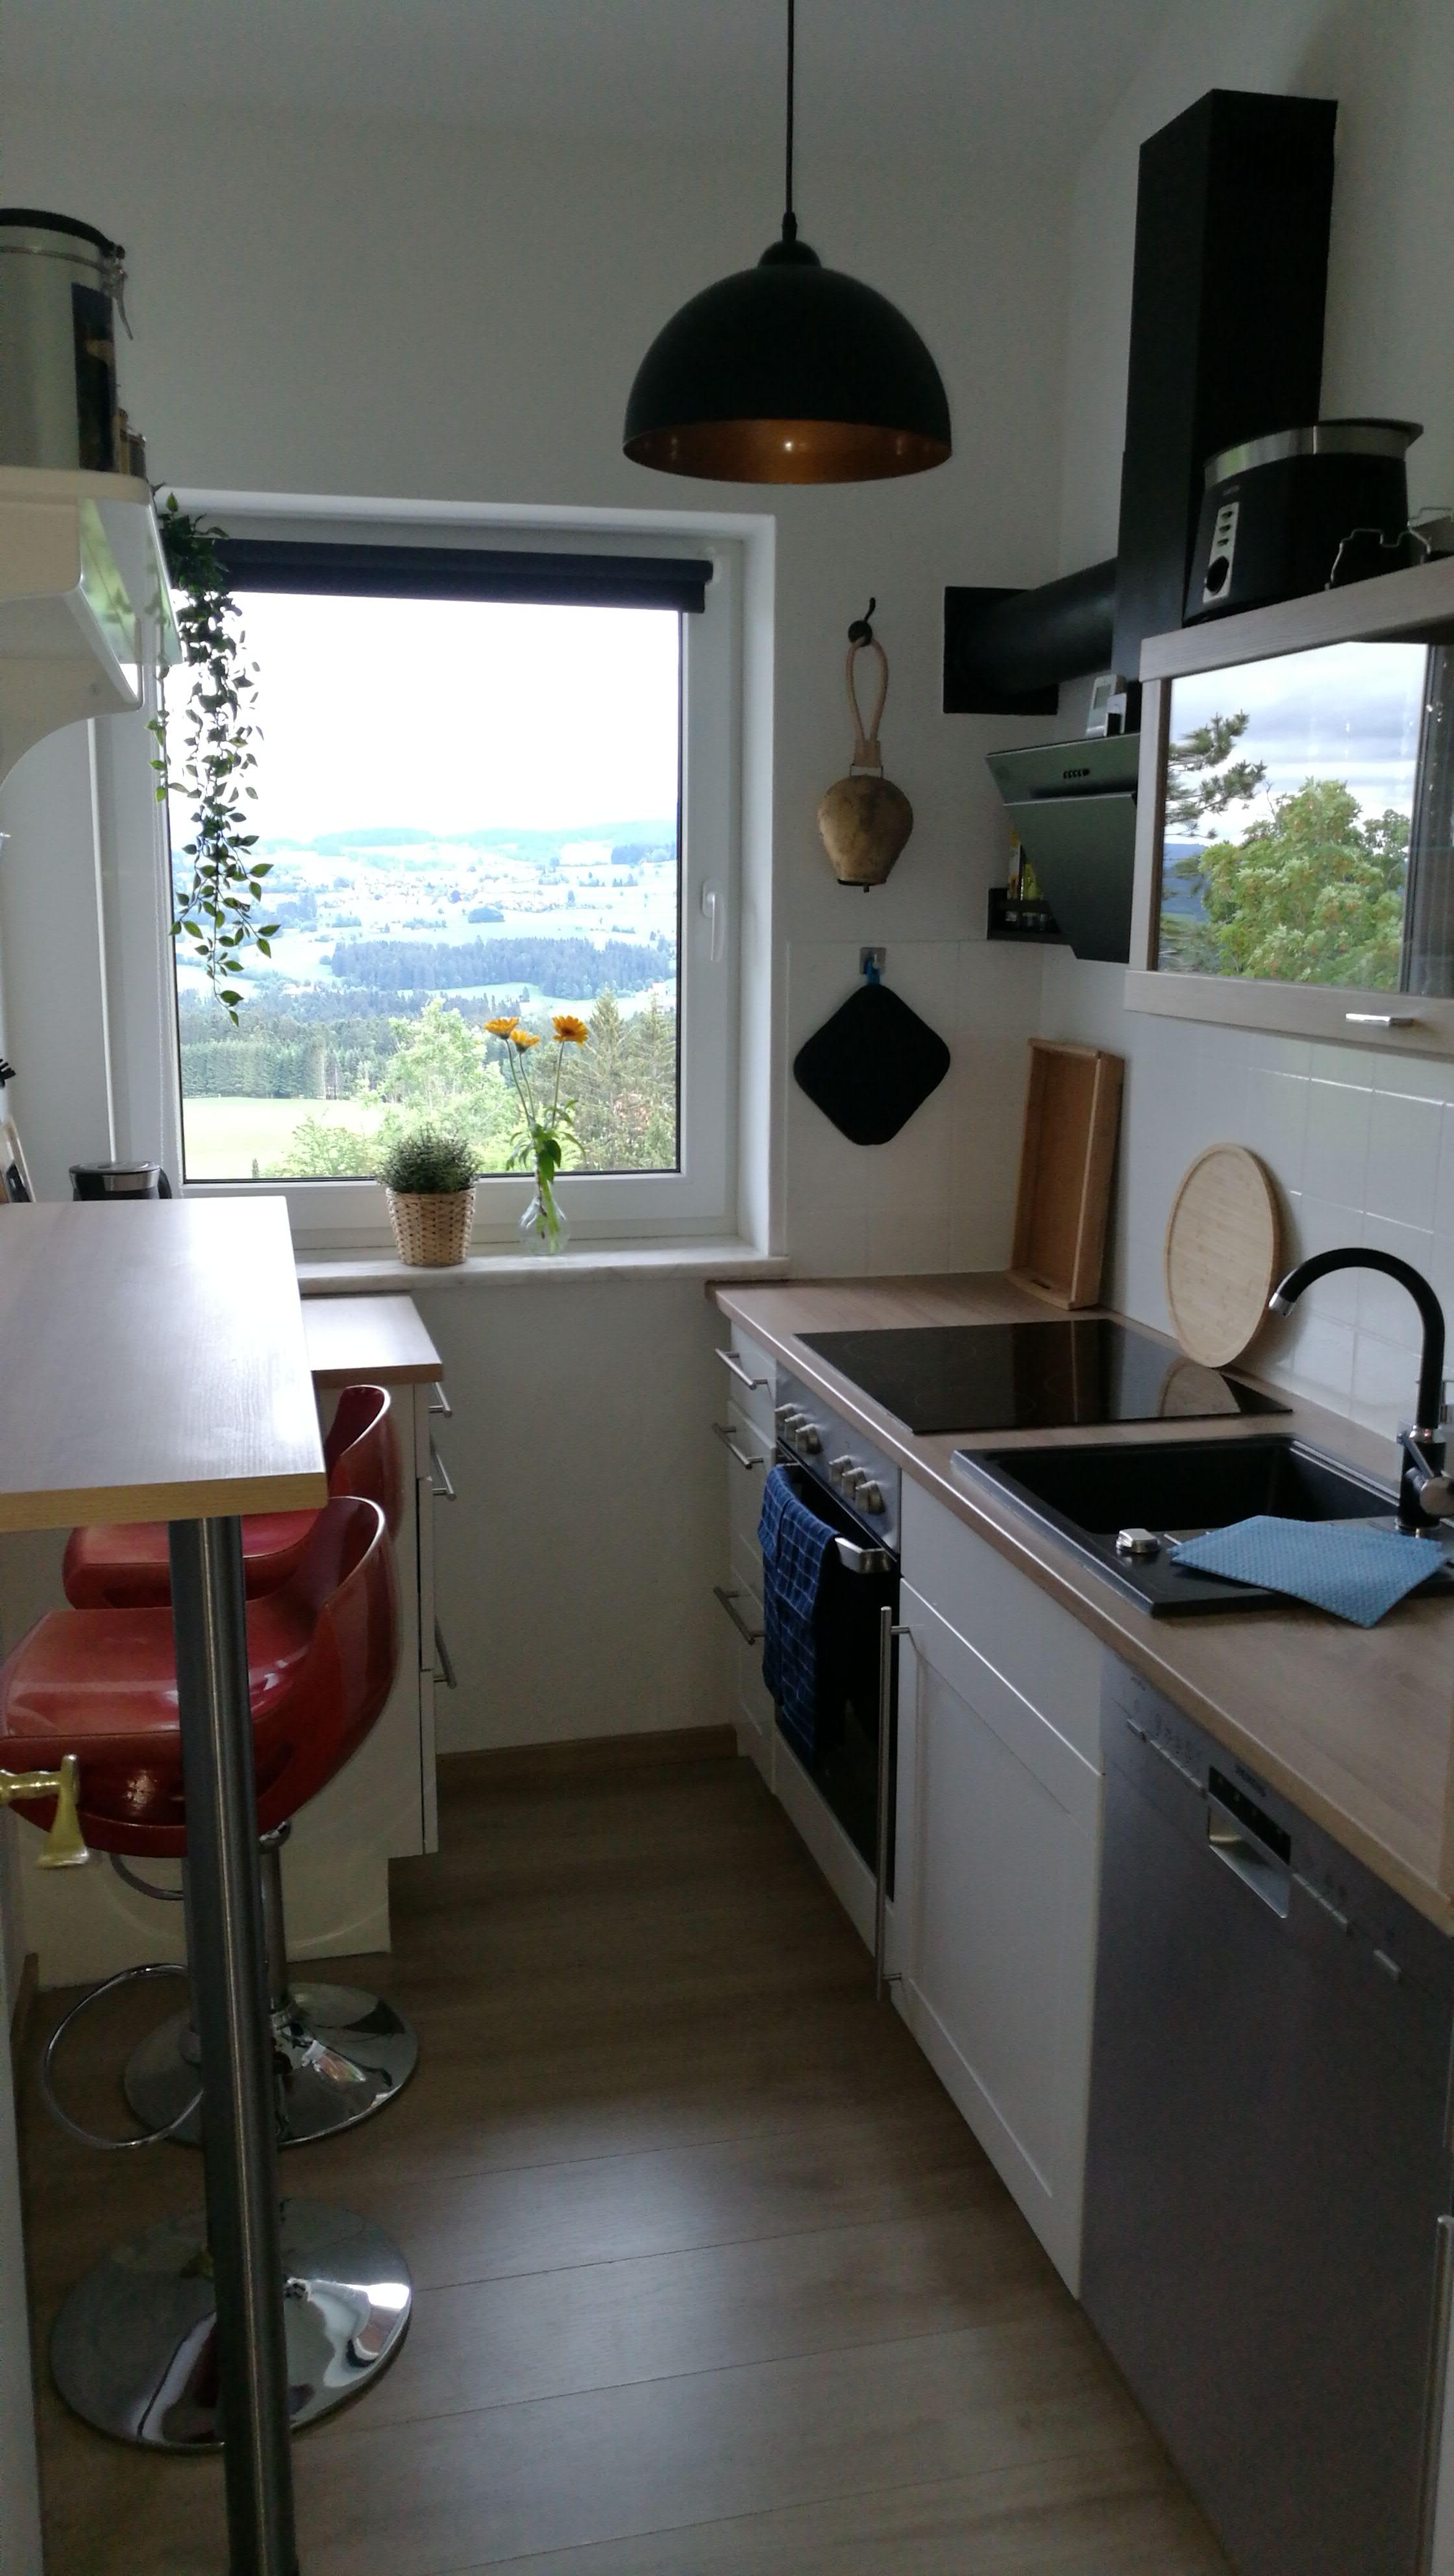 Lindenalpe 53, Küche